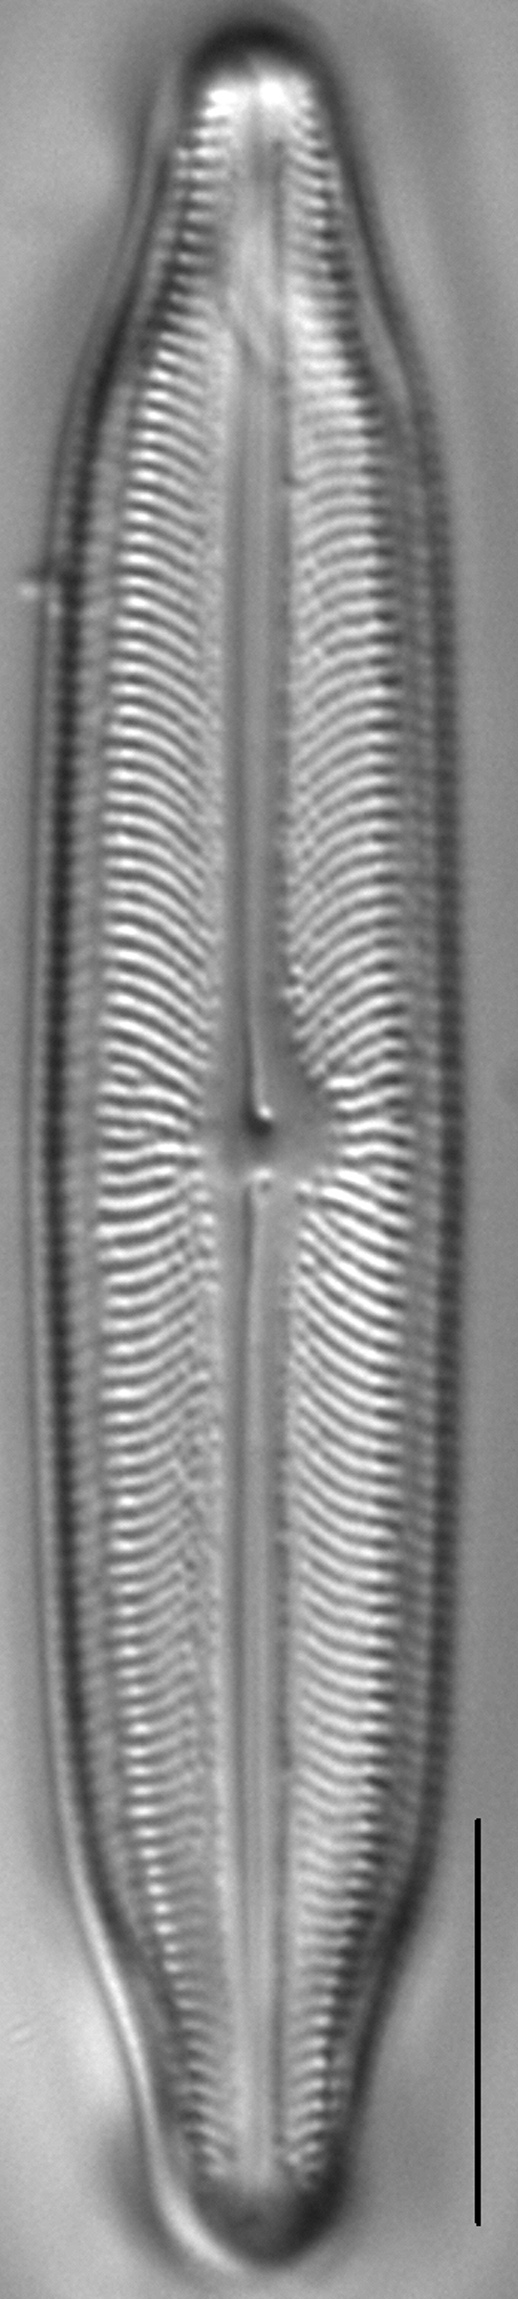 Neidiopsis weilandii LM2